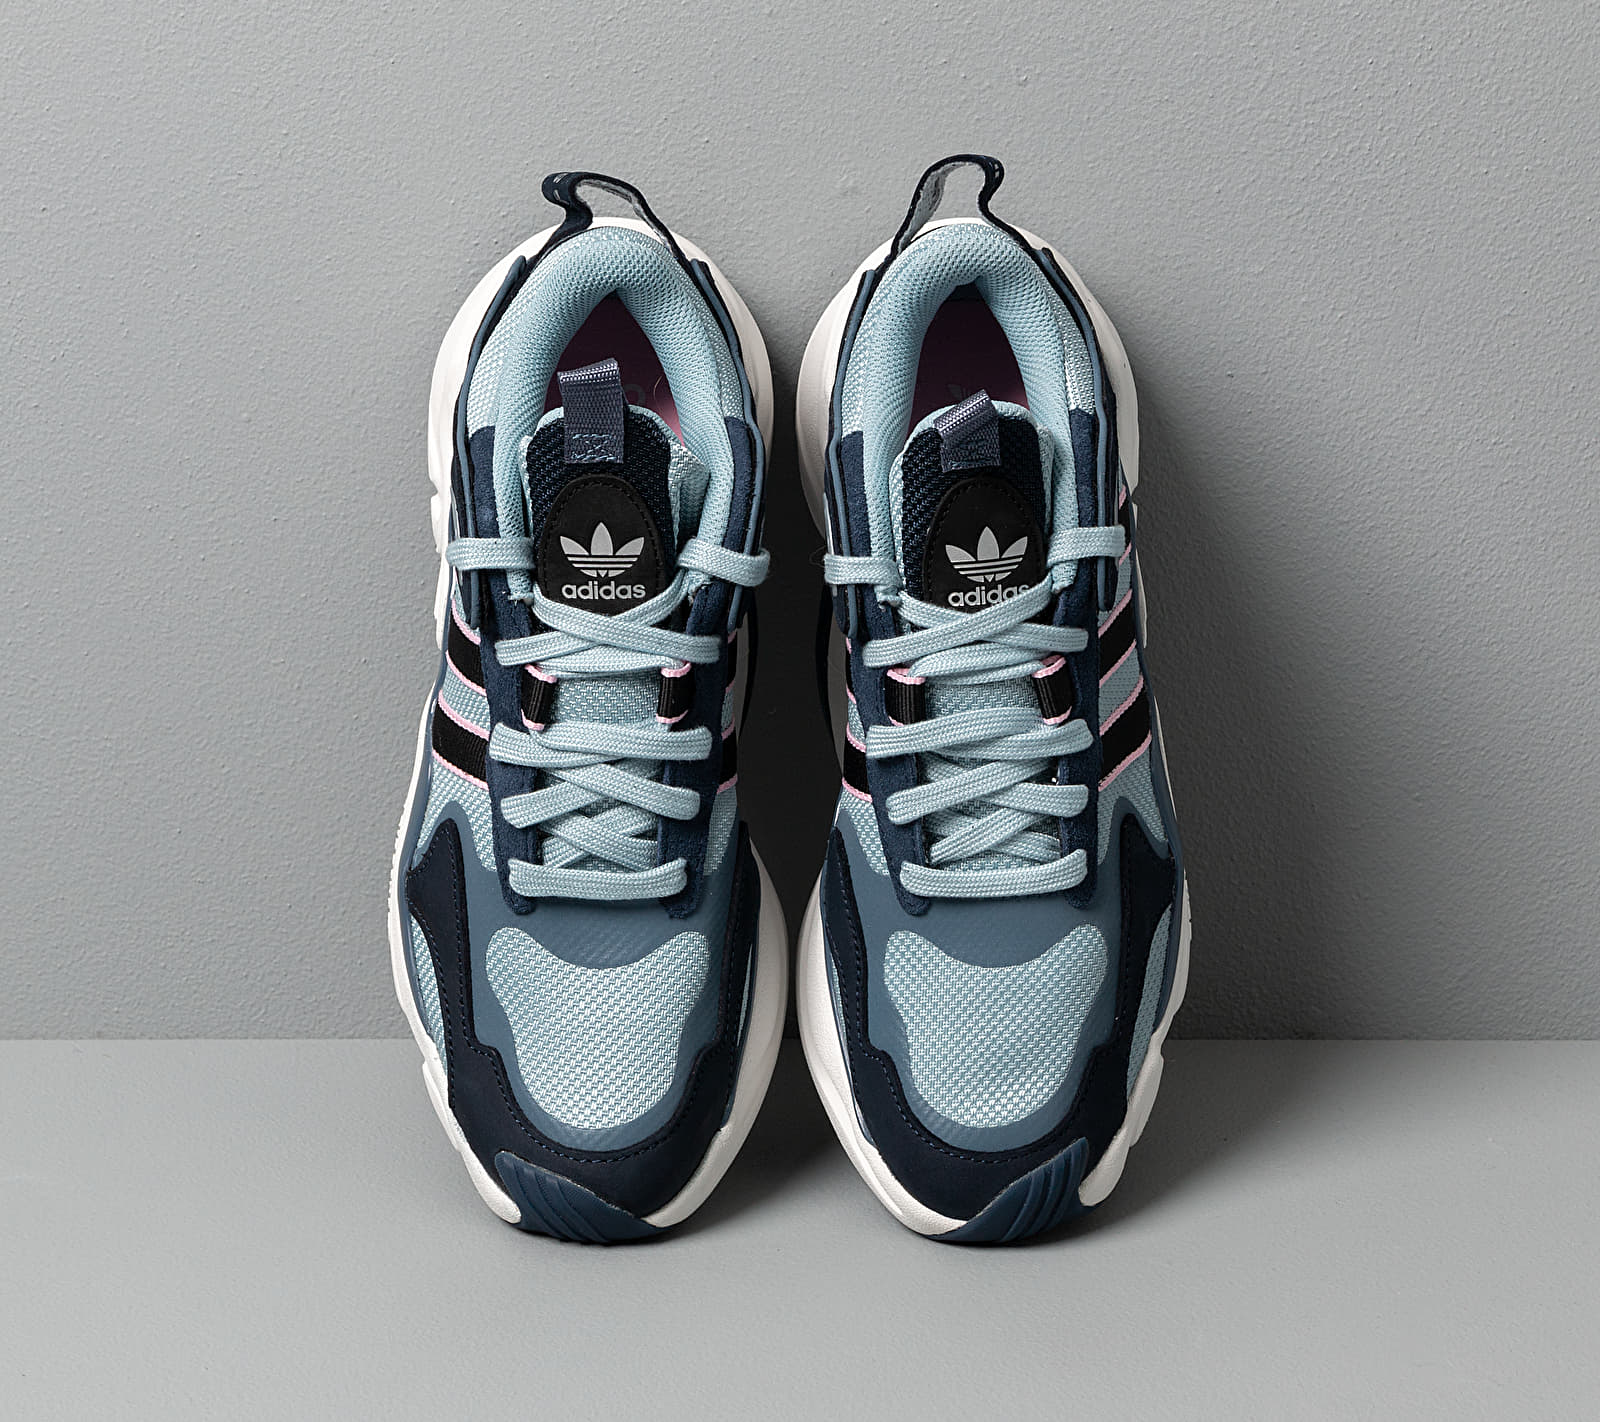 adidas Magmur Runner W Ash Grey/ Core Black/ Tech Ink, Gray